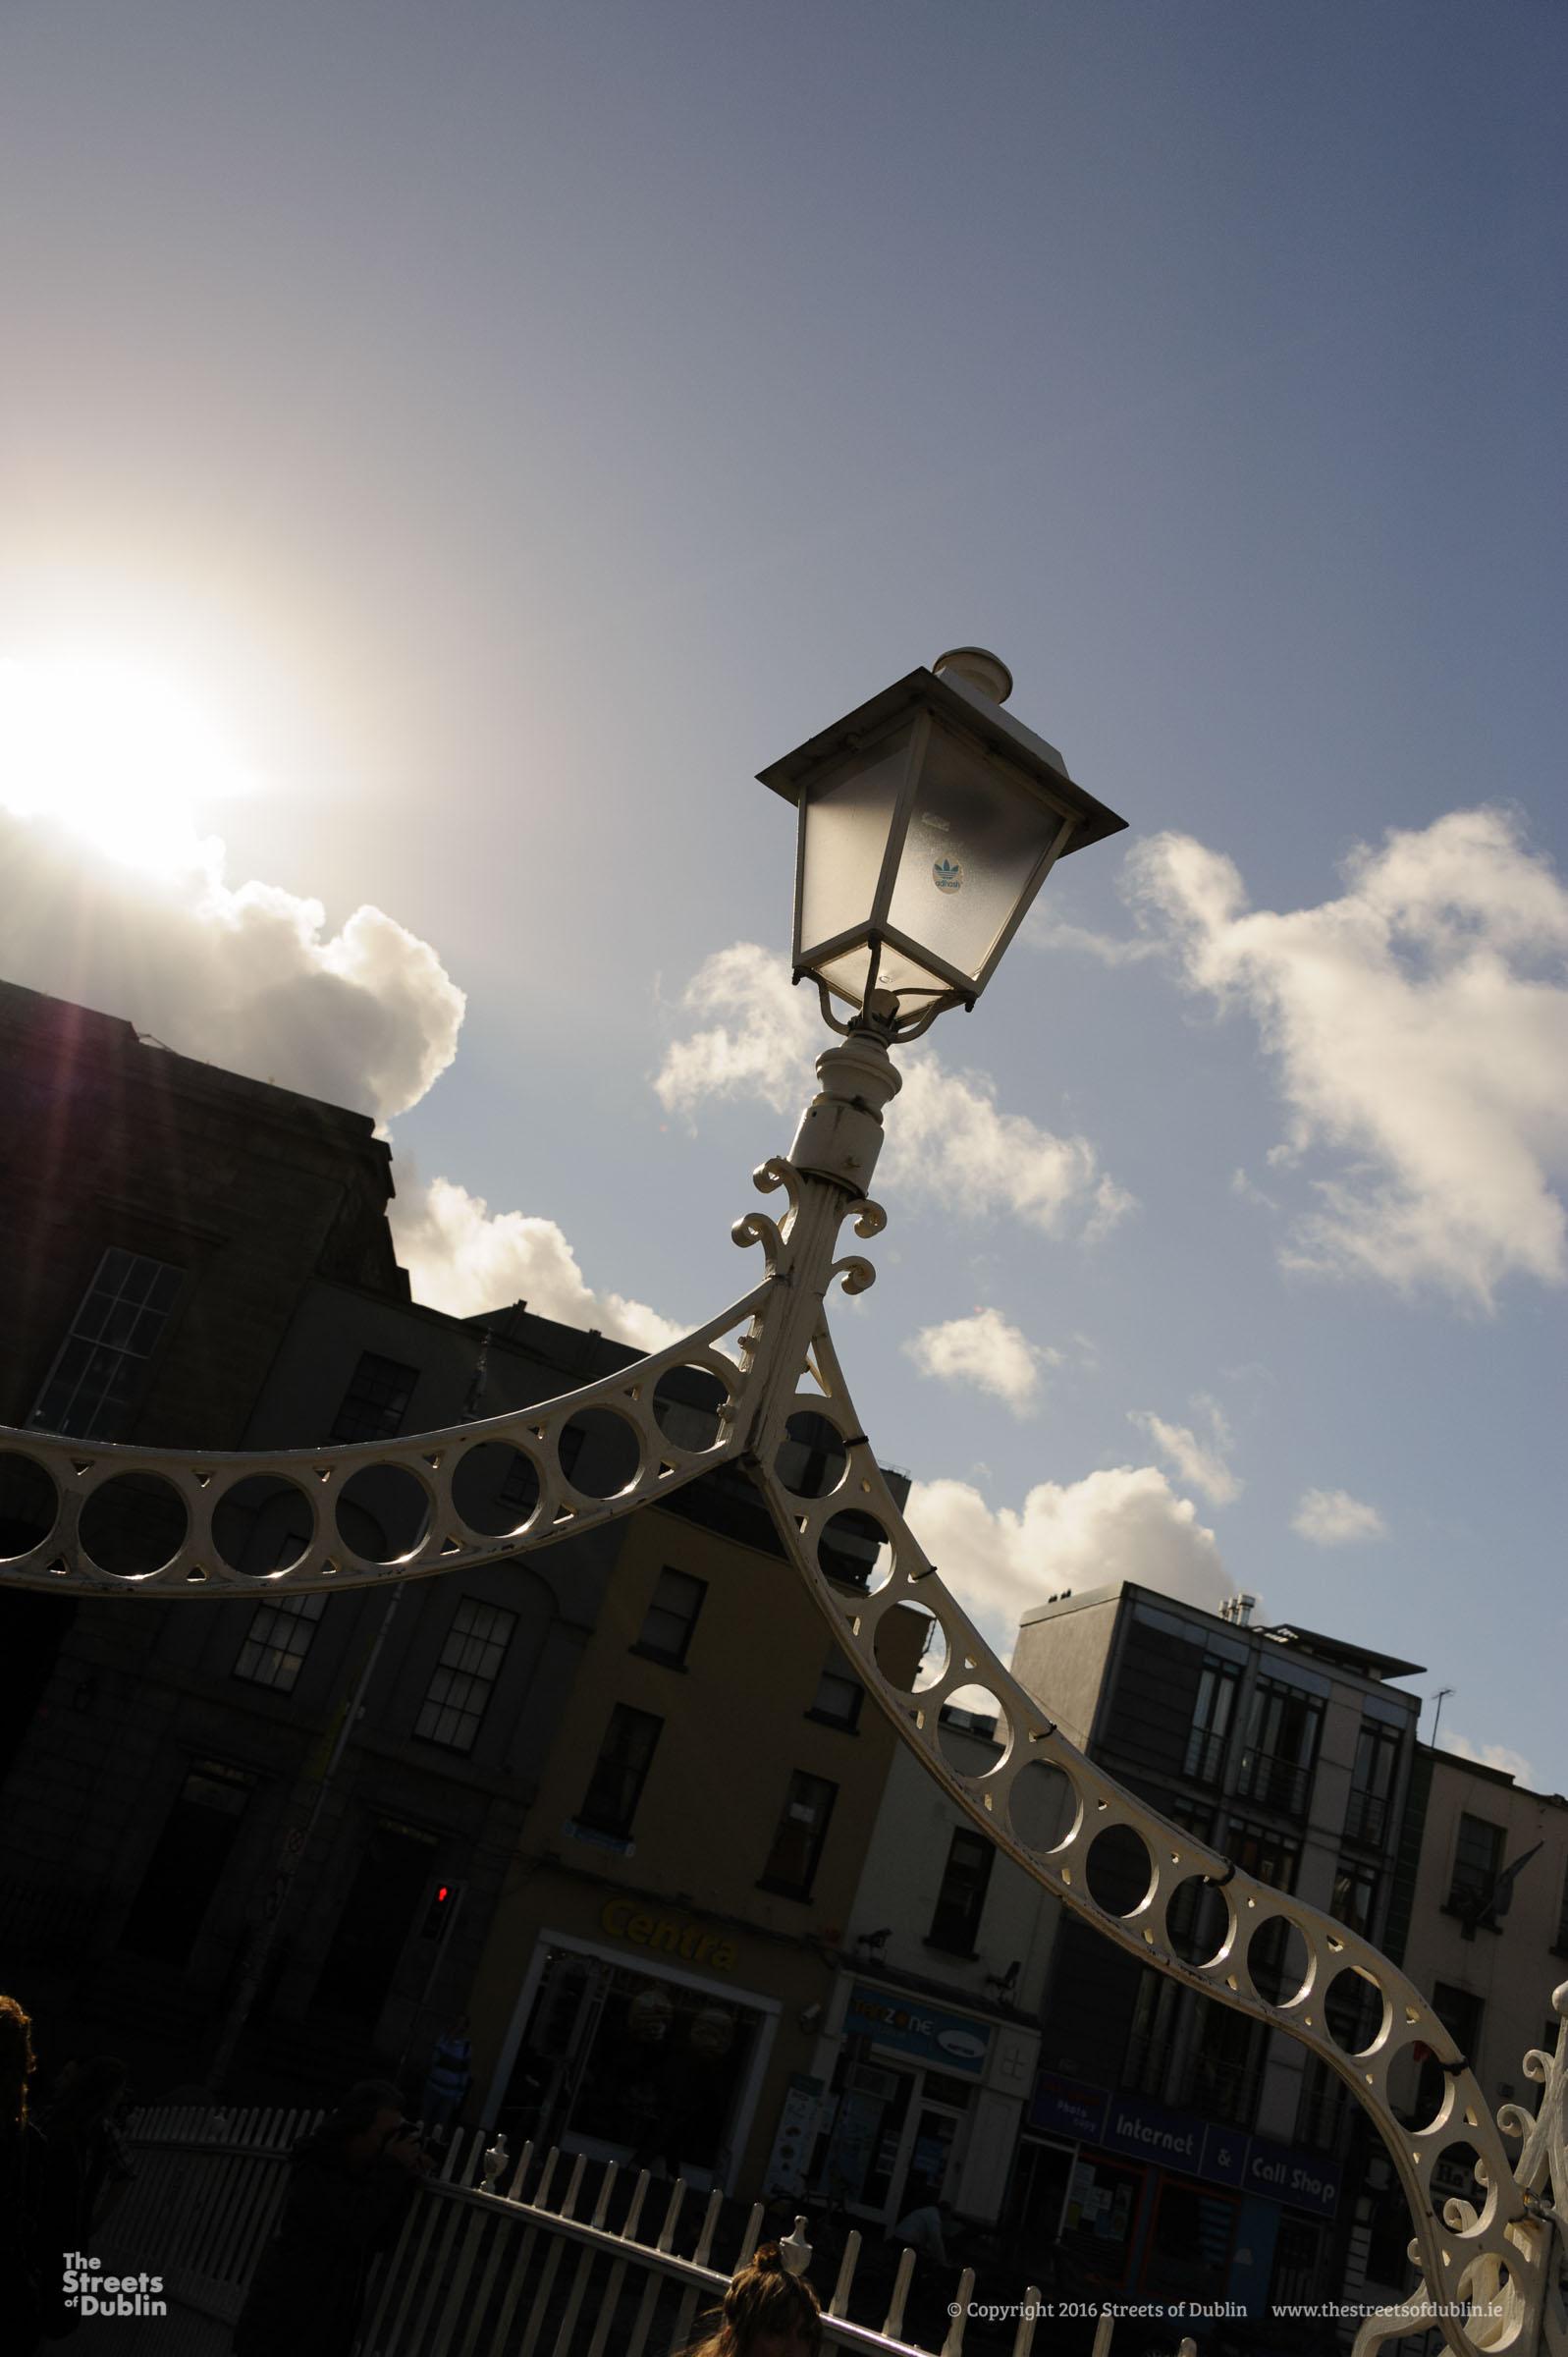 Streets-of-Dublin-Photo-2-22.jpg